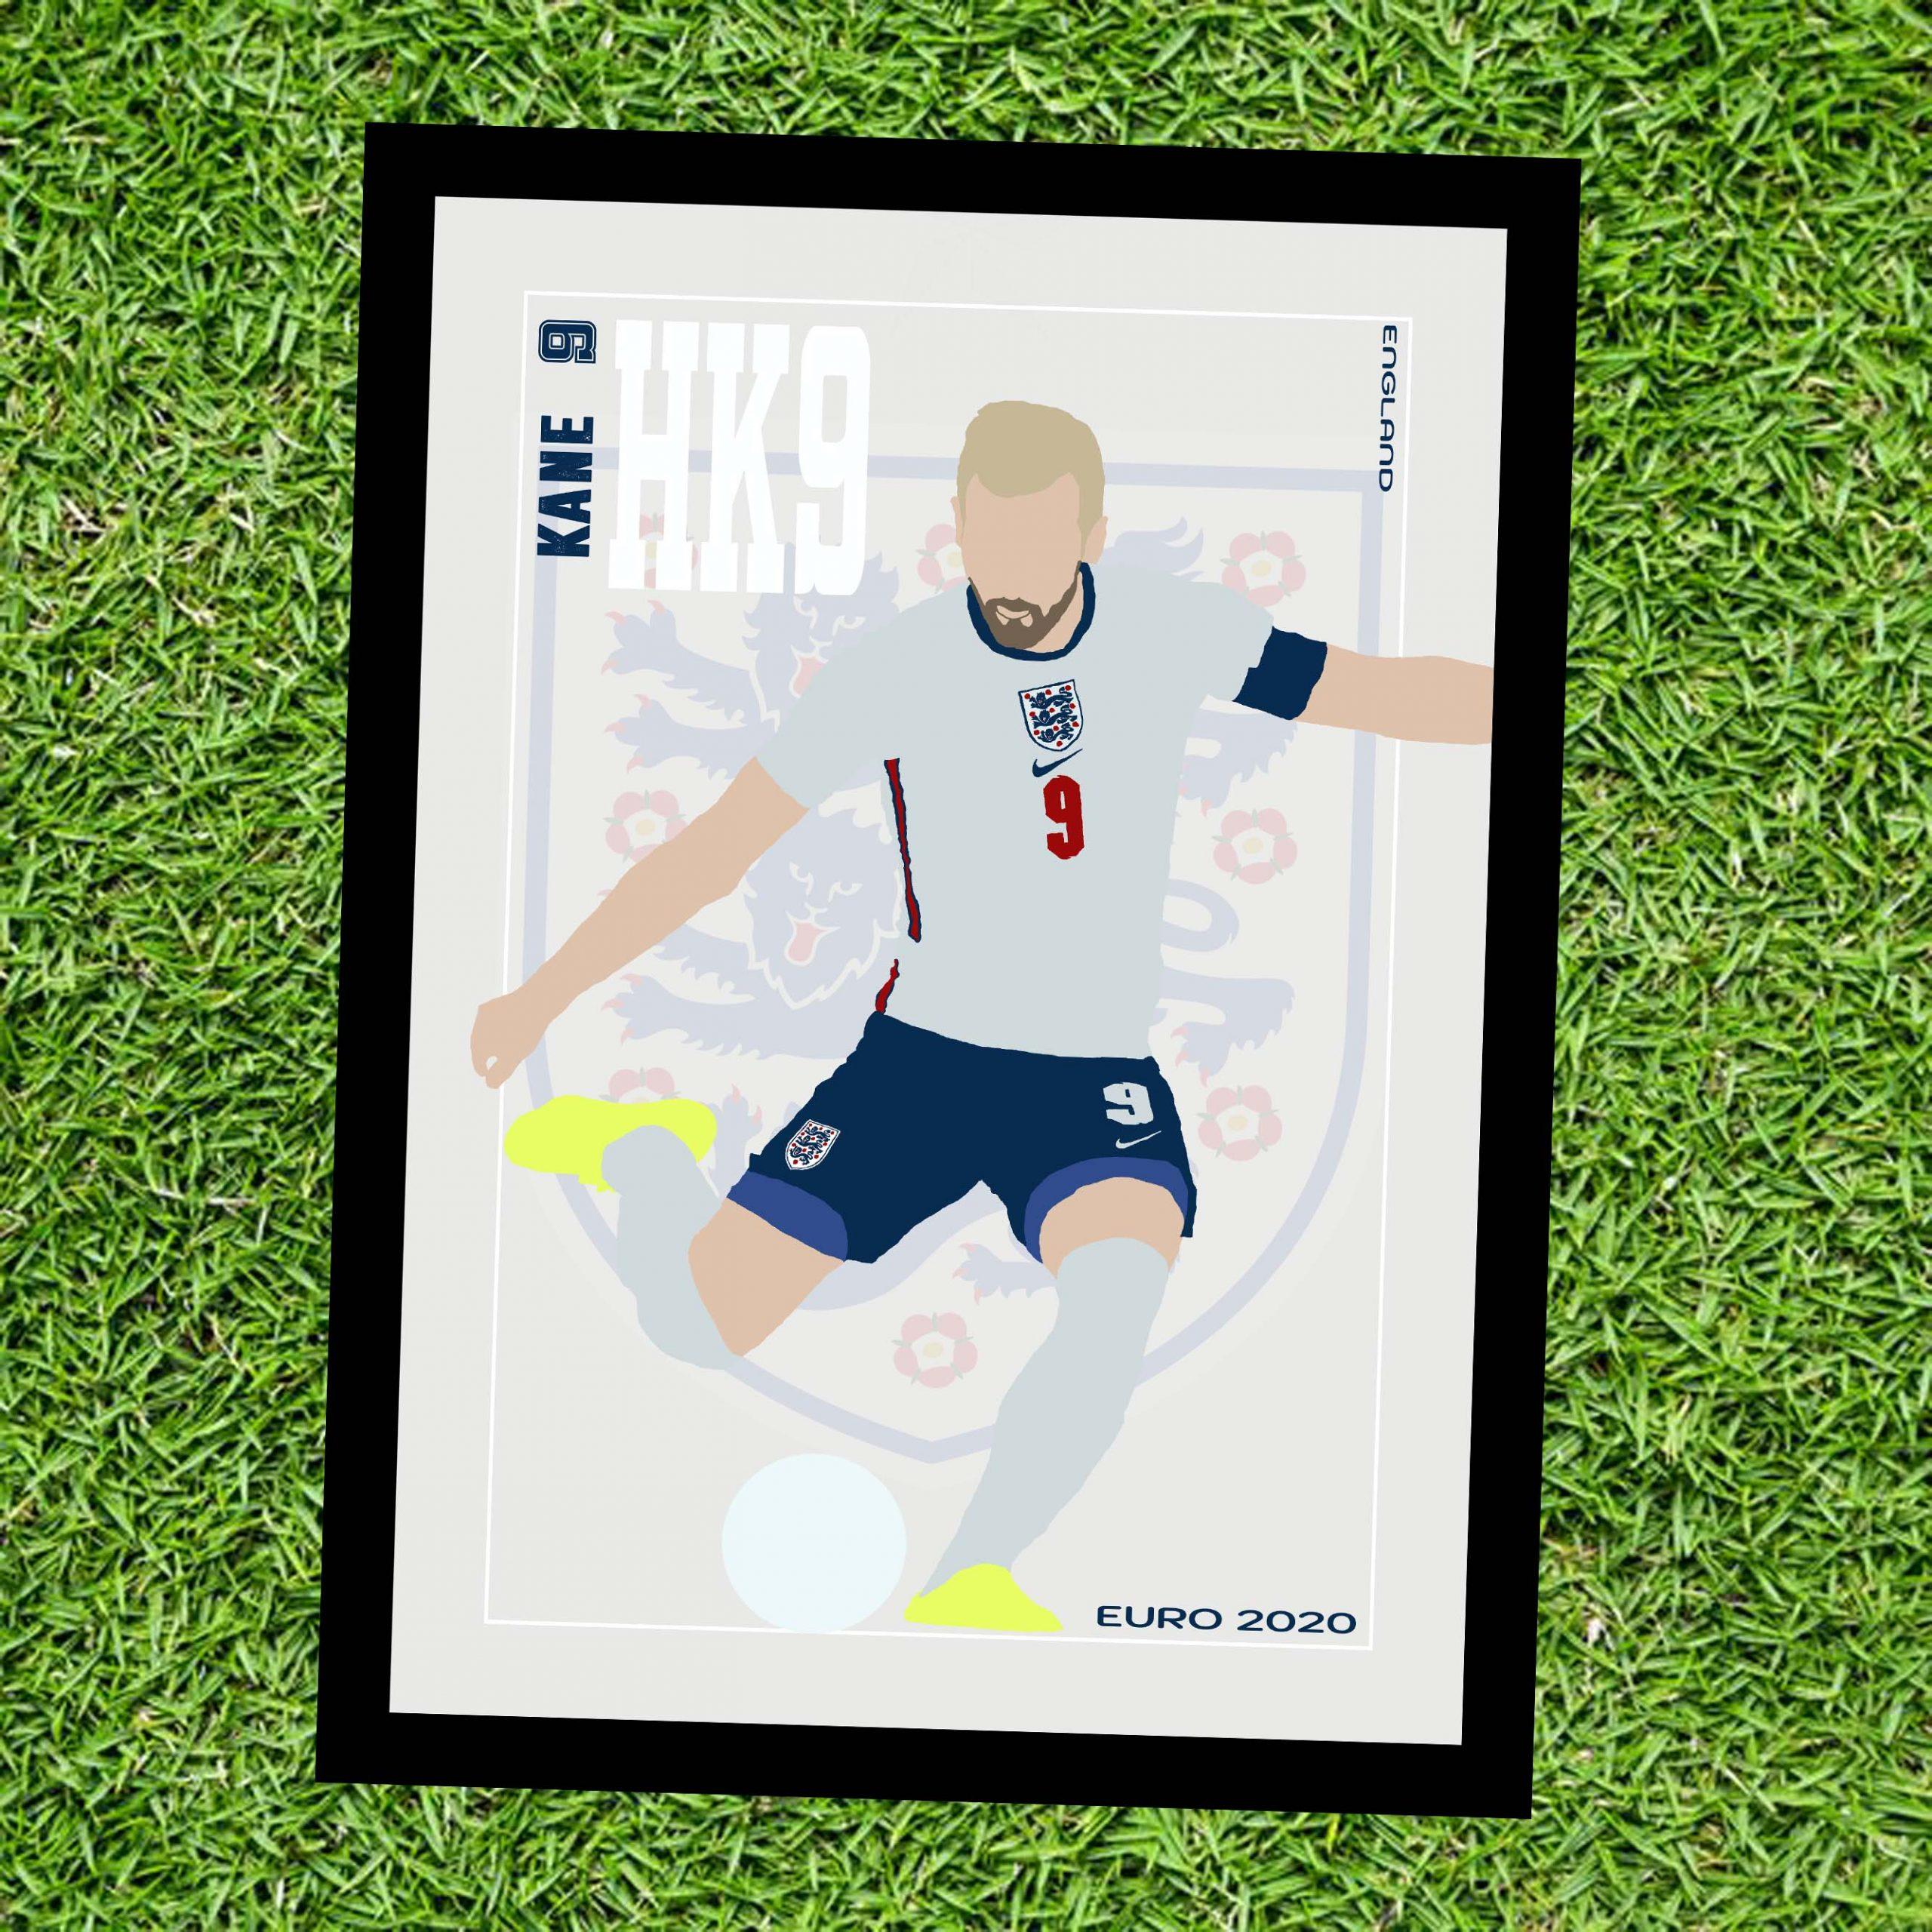 Harry Kane - HK9 - Part of MaadWeb's Euro 2020 Series - Wall Art Print - on Grass - MaadWeb